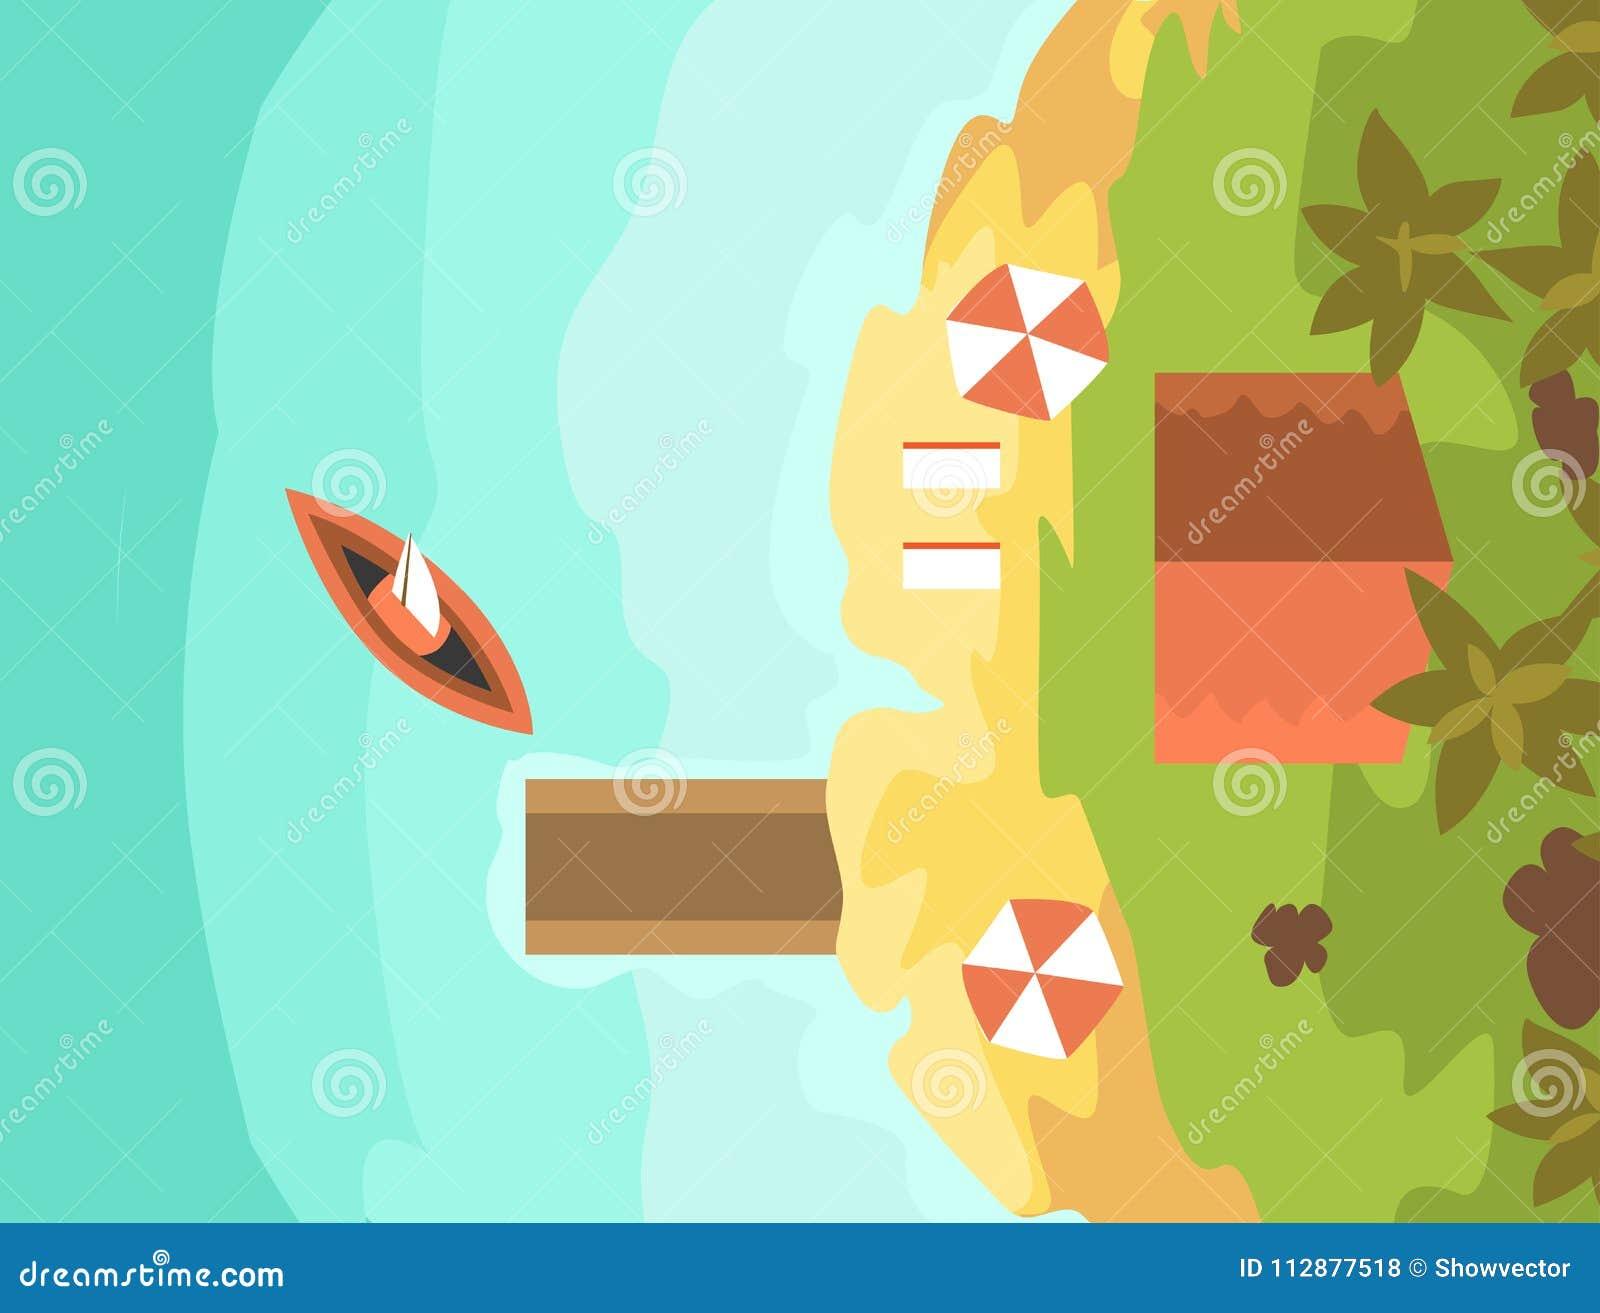 Cartoon Tropical Exotic Island In Ocean Top View Exotic Lagoon Map